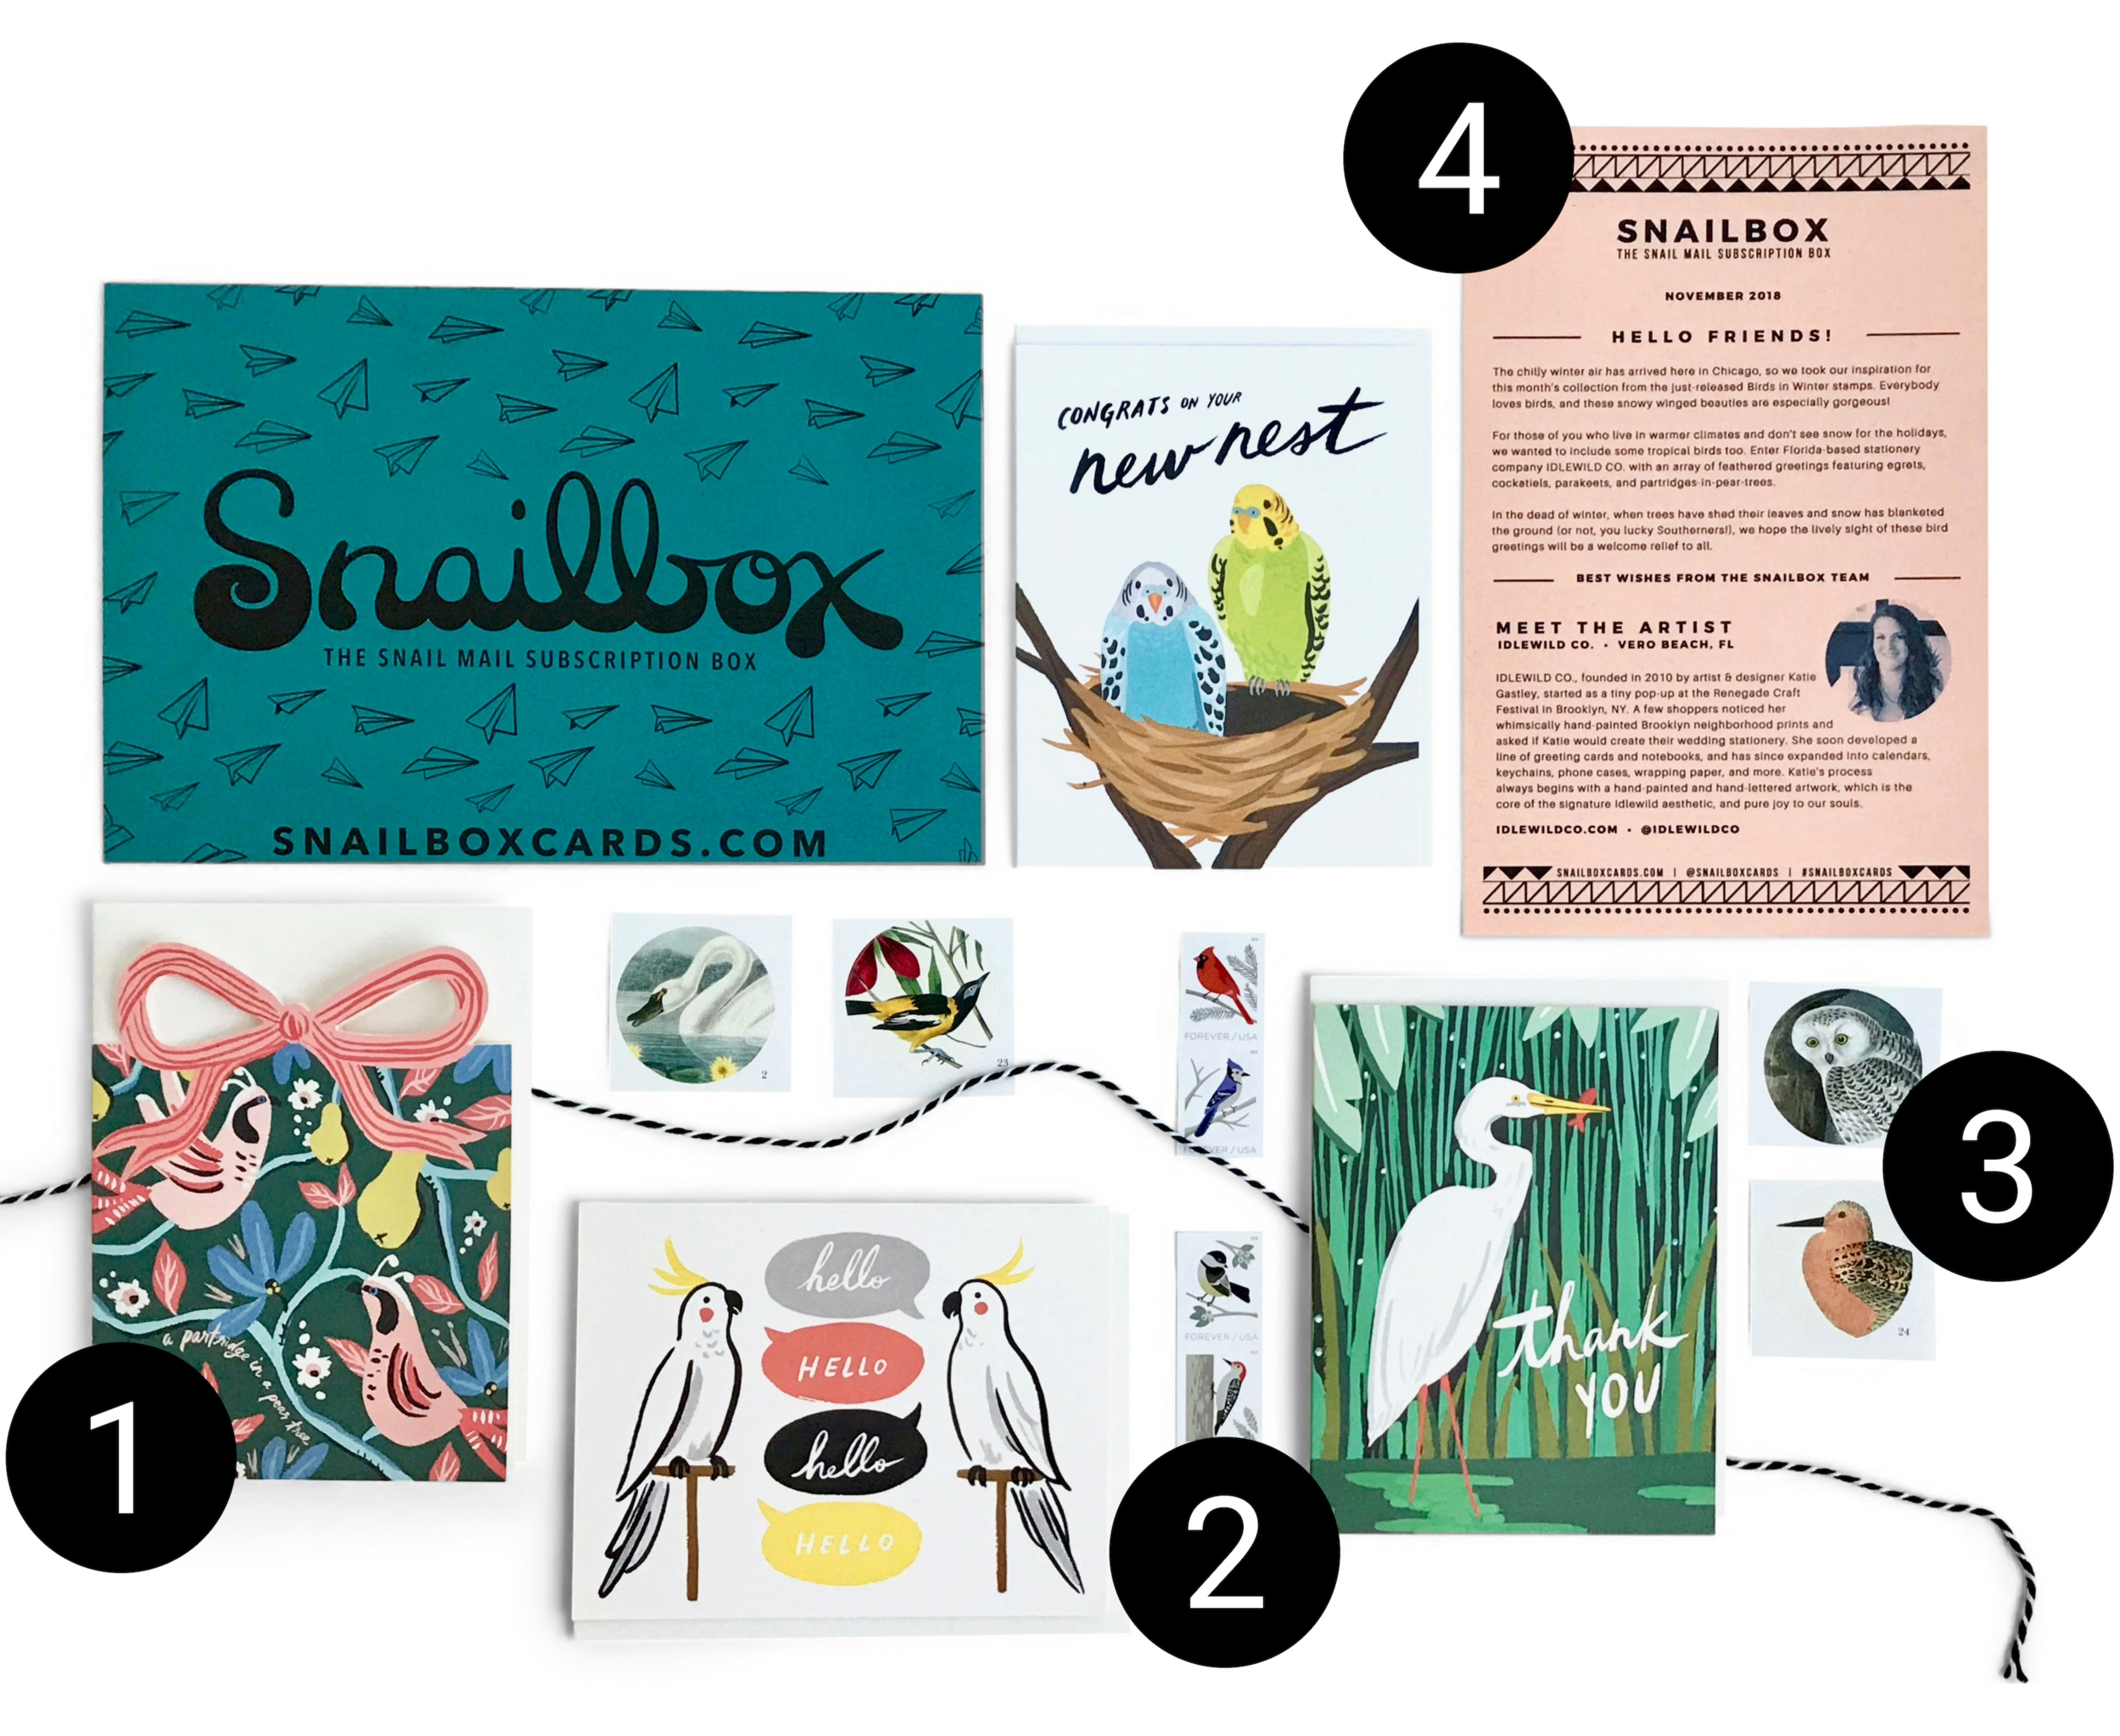 Snailbox Subscription Contents